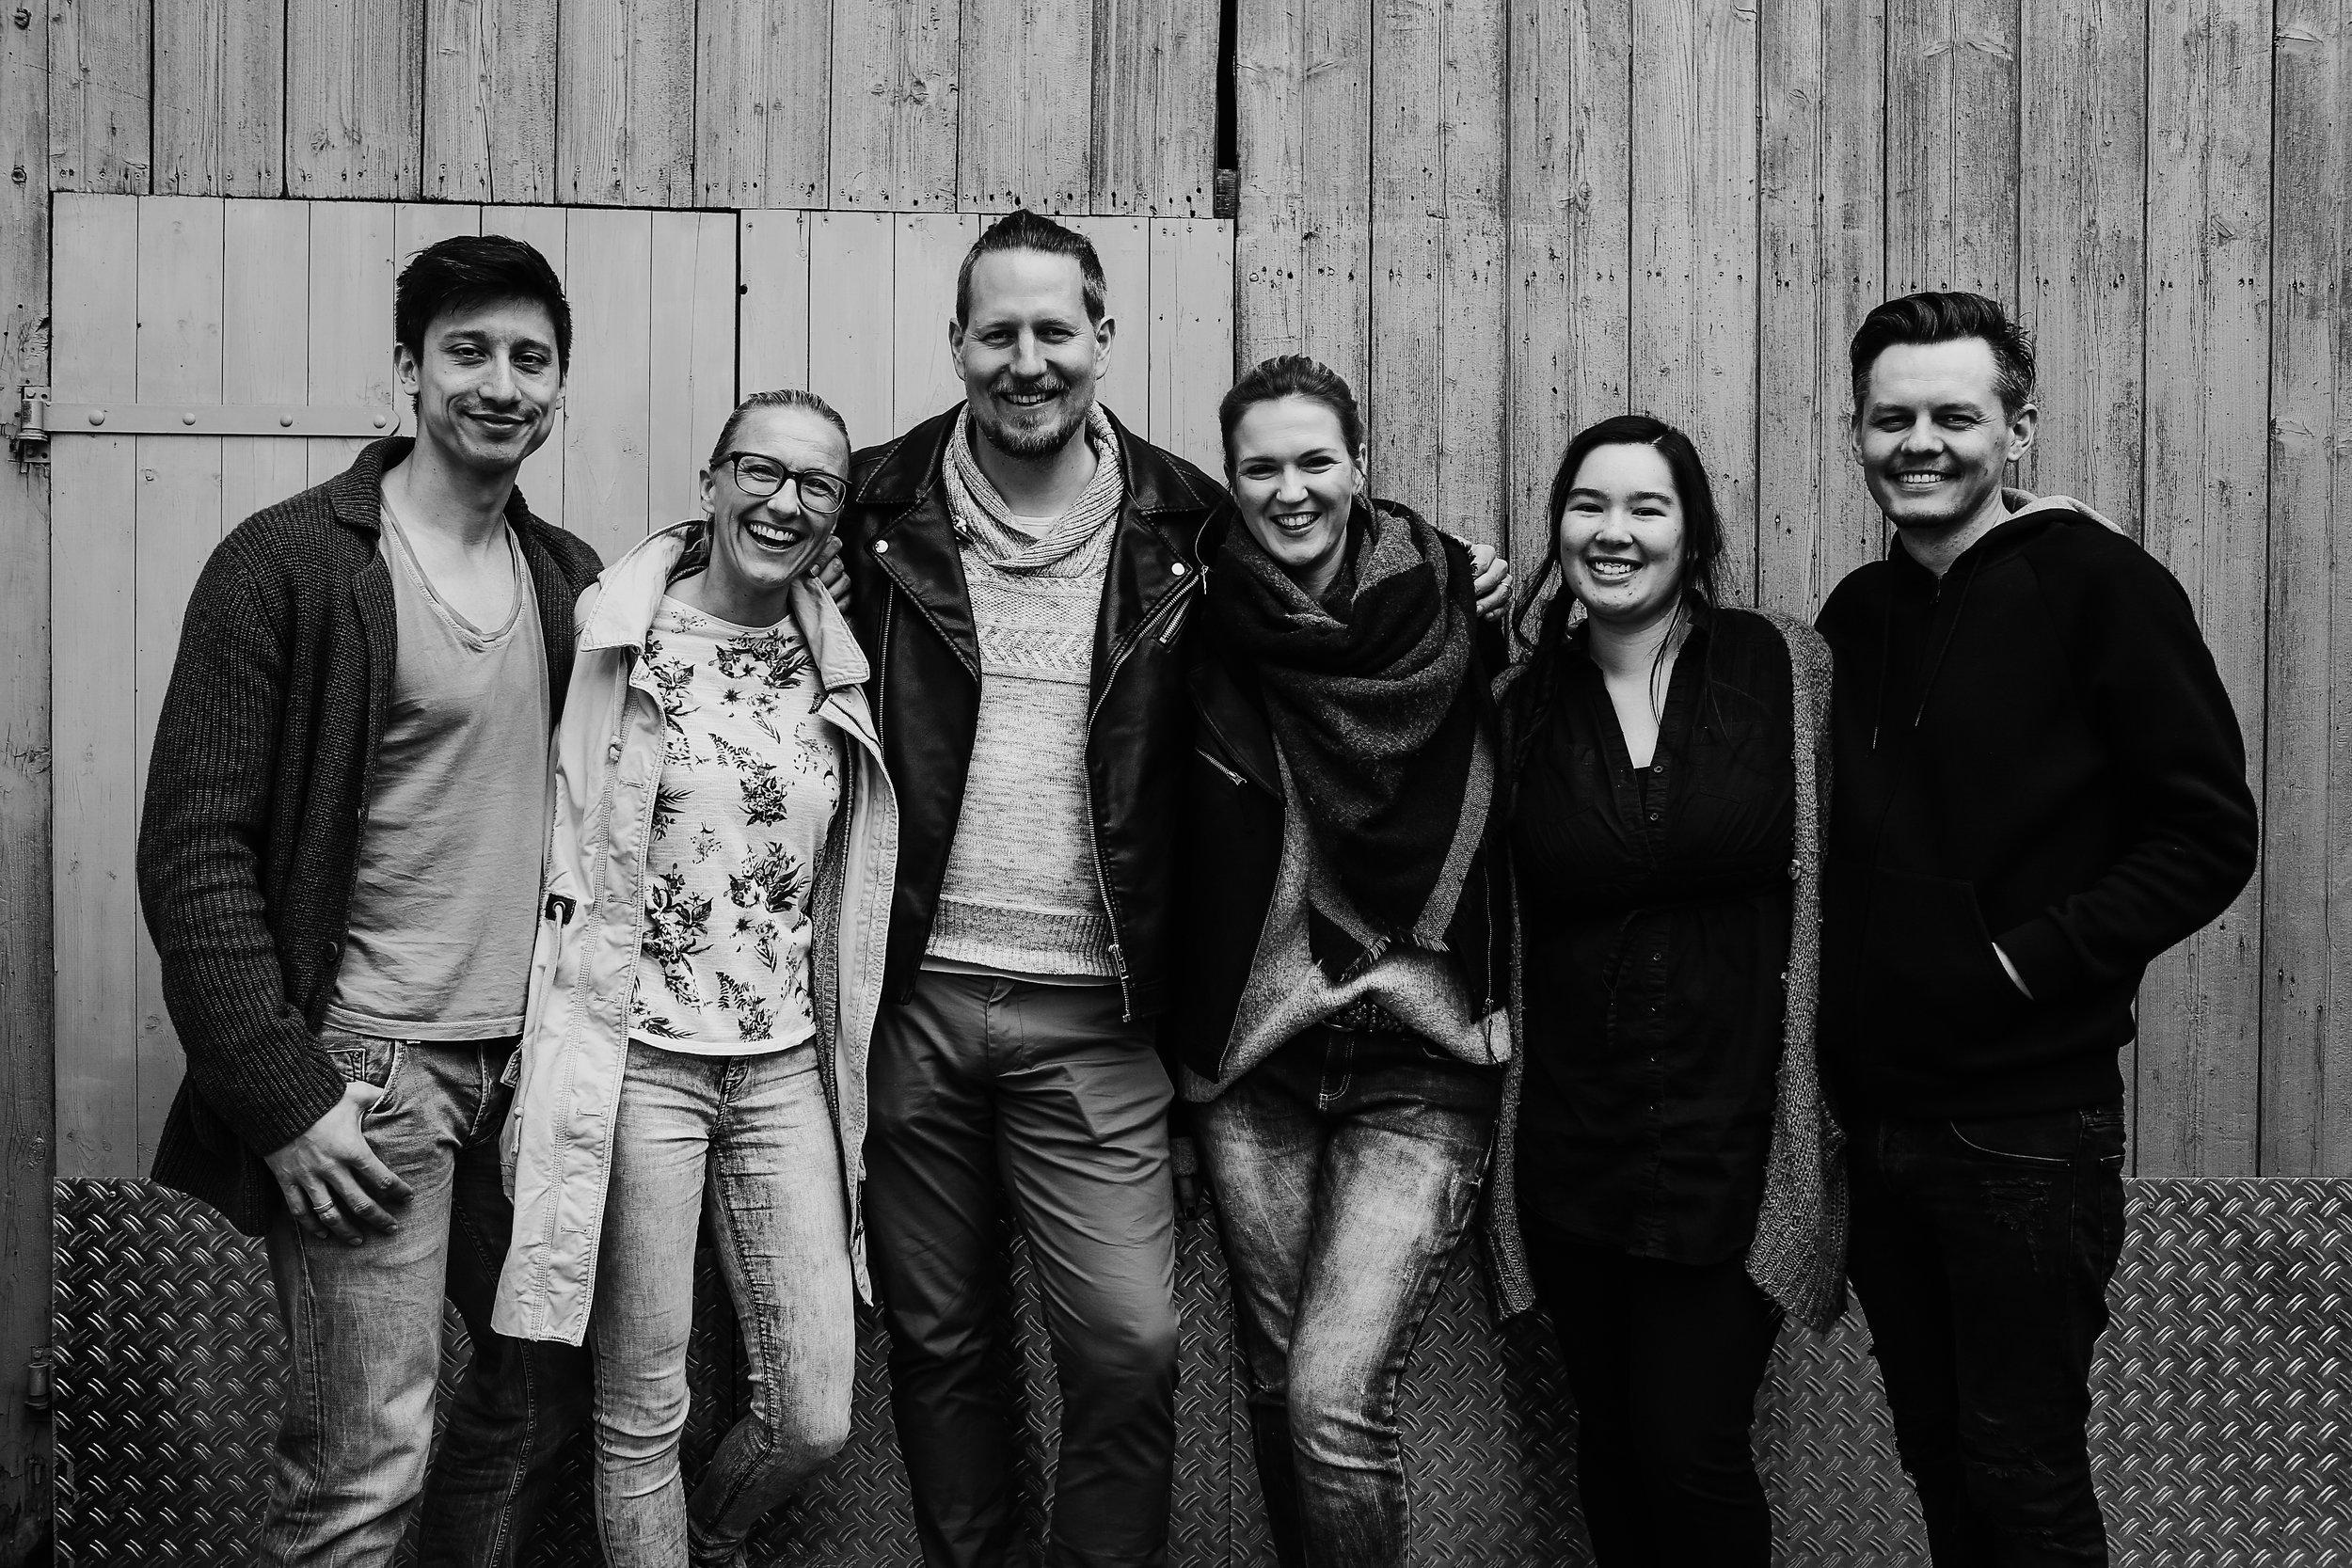 Olli, Nadine, Jan, Nicole, Kate und Sergej